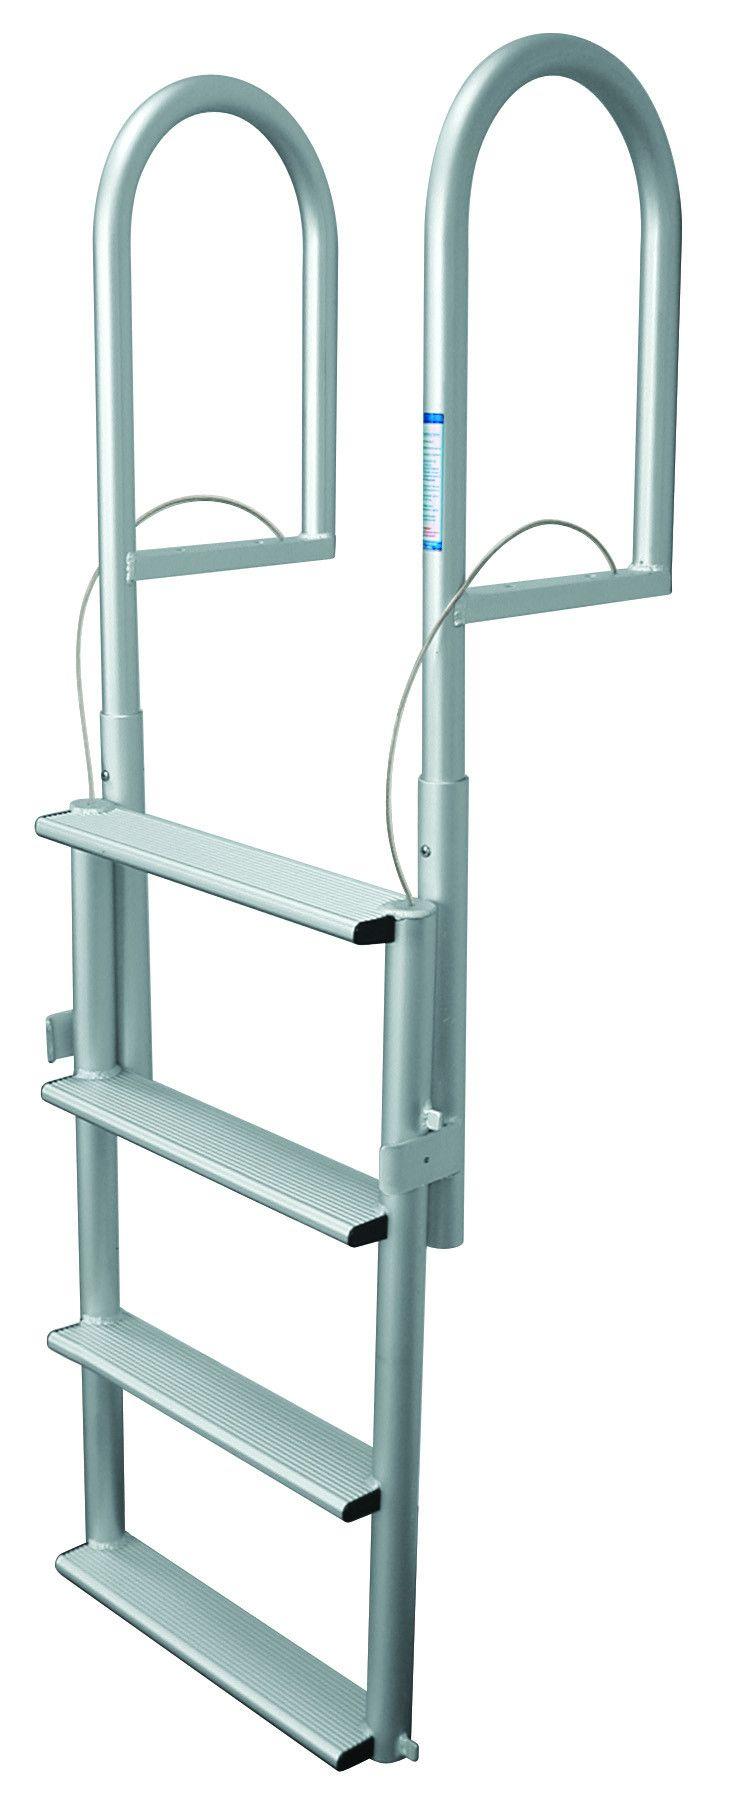 7 Best Dock Ladders Images On Pinterest Dock Ladders